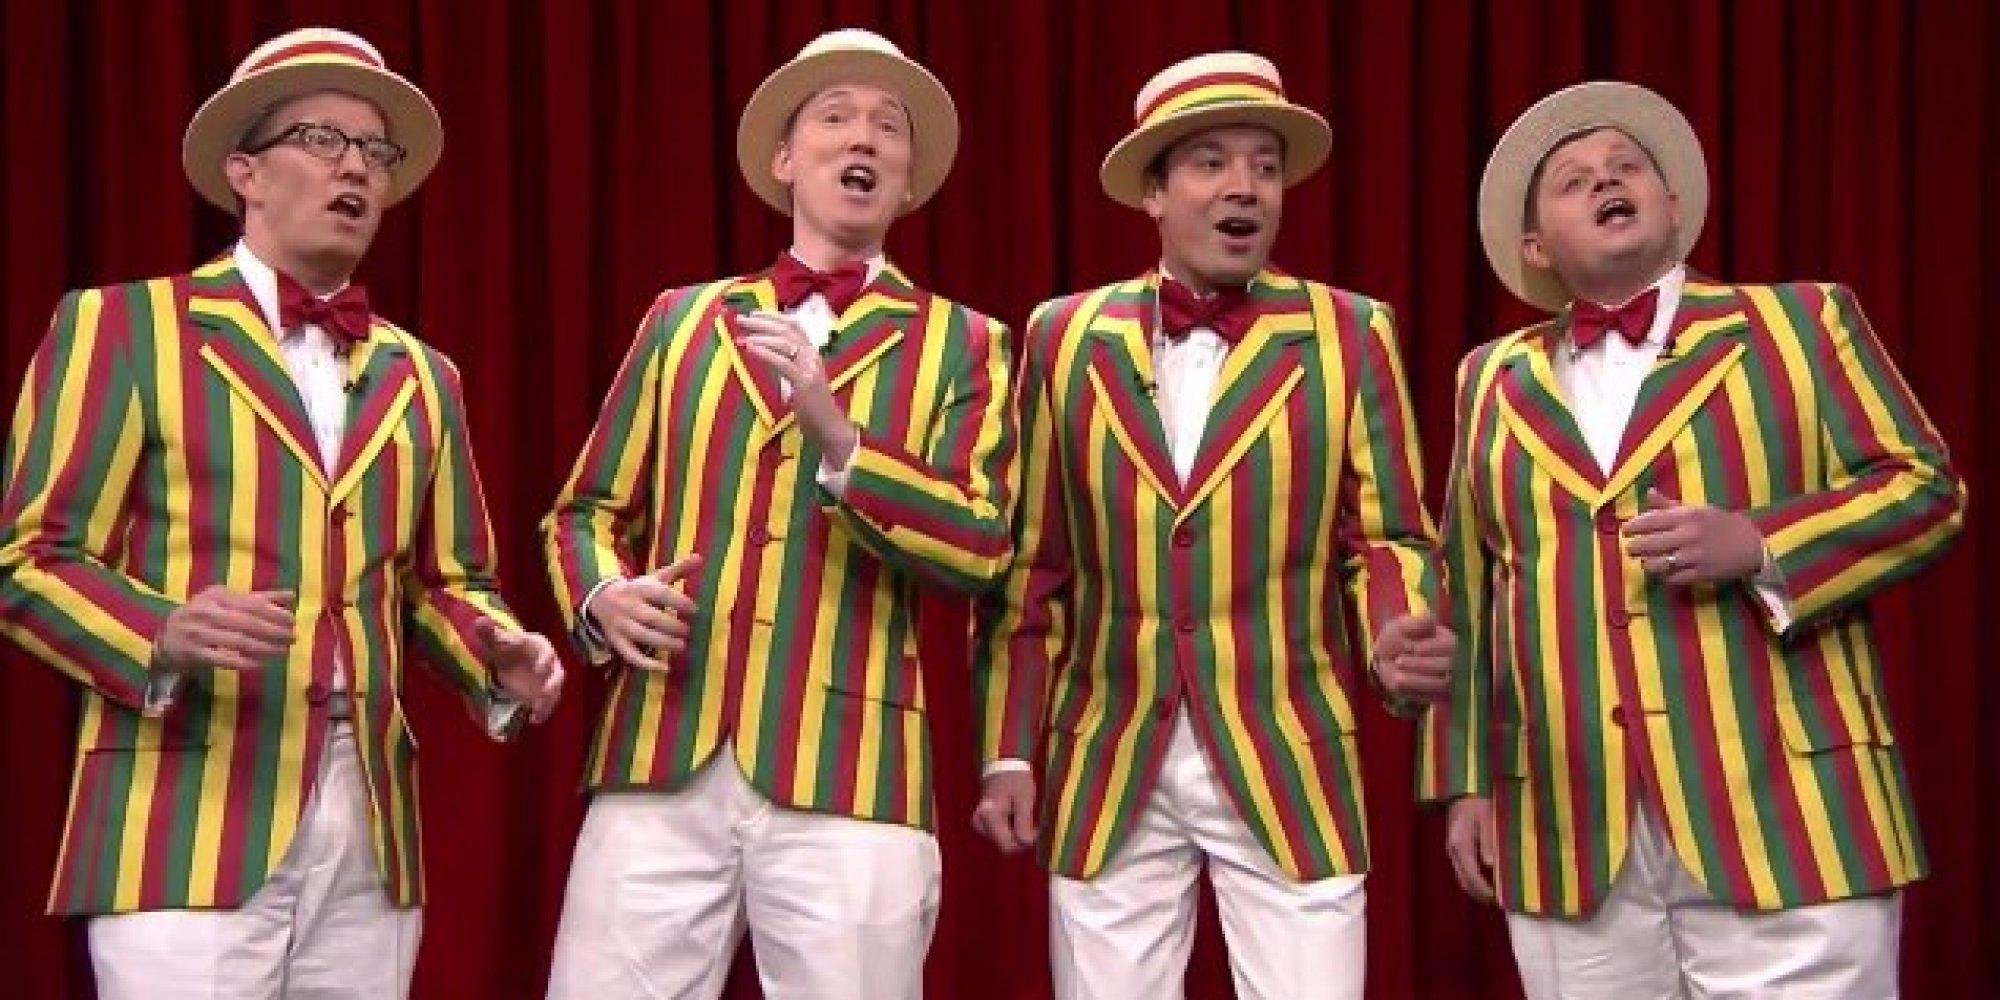 Barber Quartet : ... Performed As A Barbershop Quartet On Fallon The Huffington Post